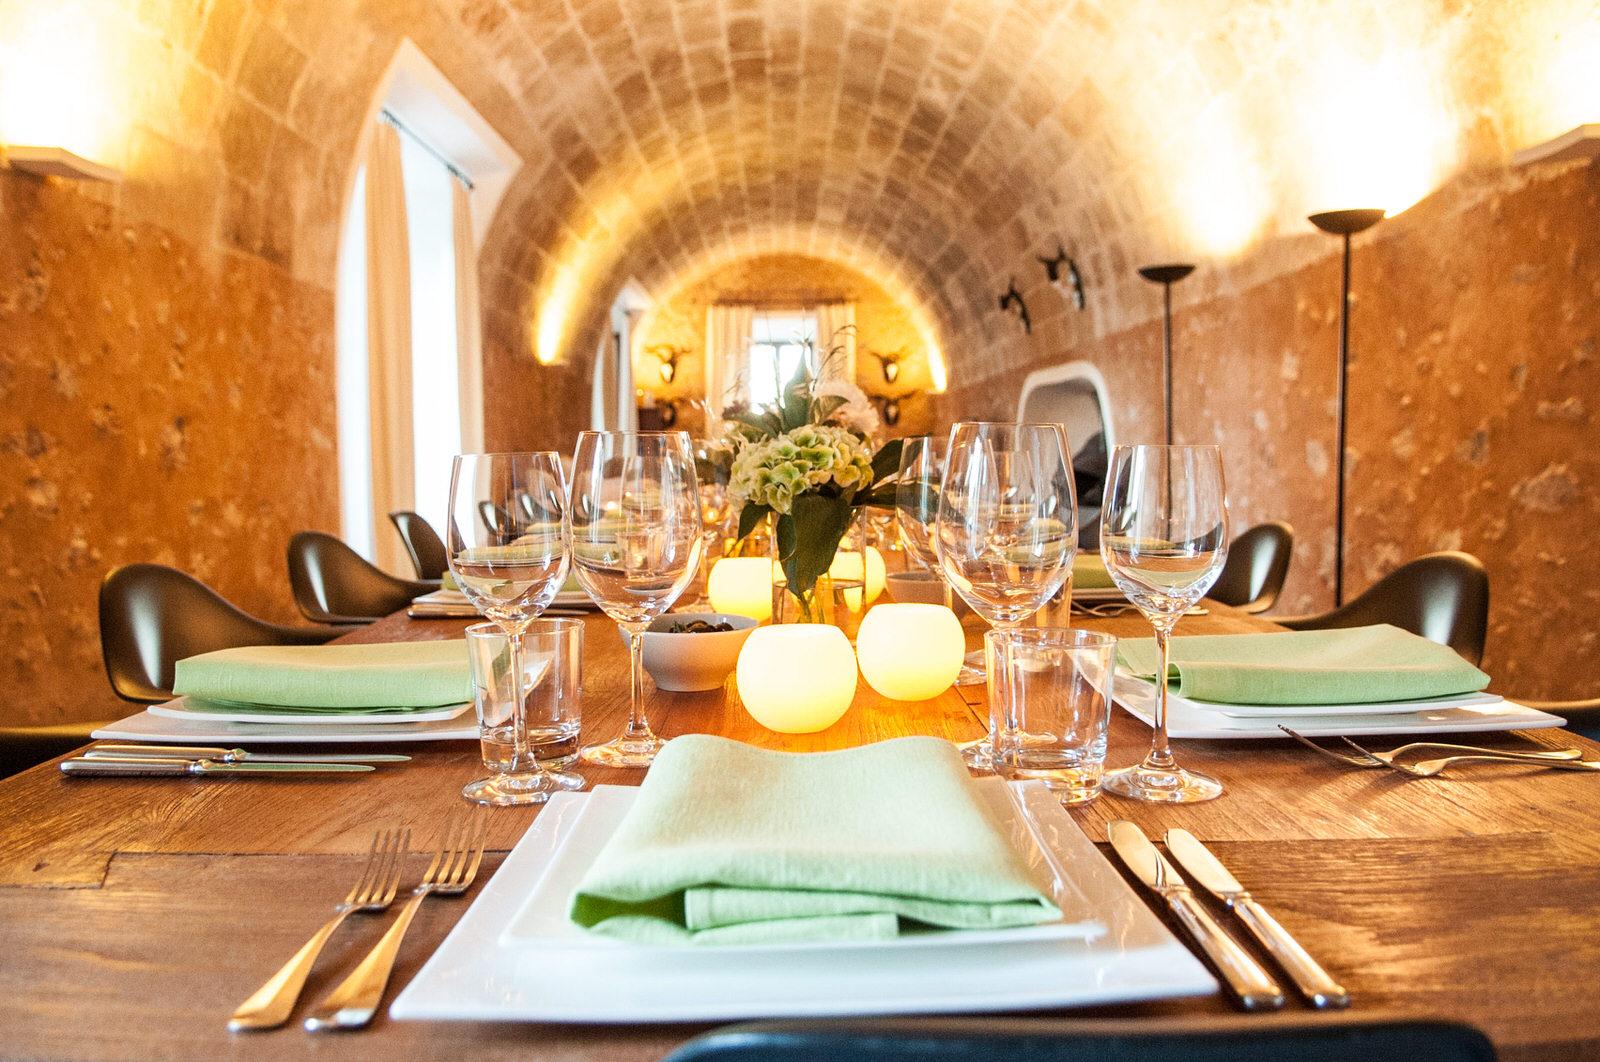 tuscany-wedding-planners-floristen-36.jpeg